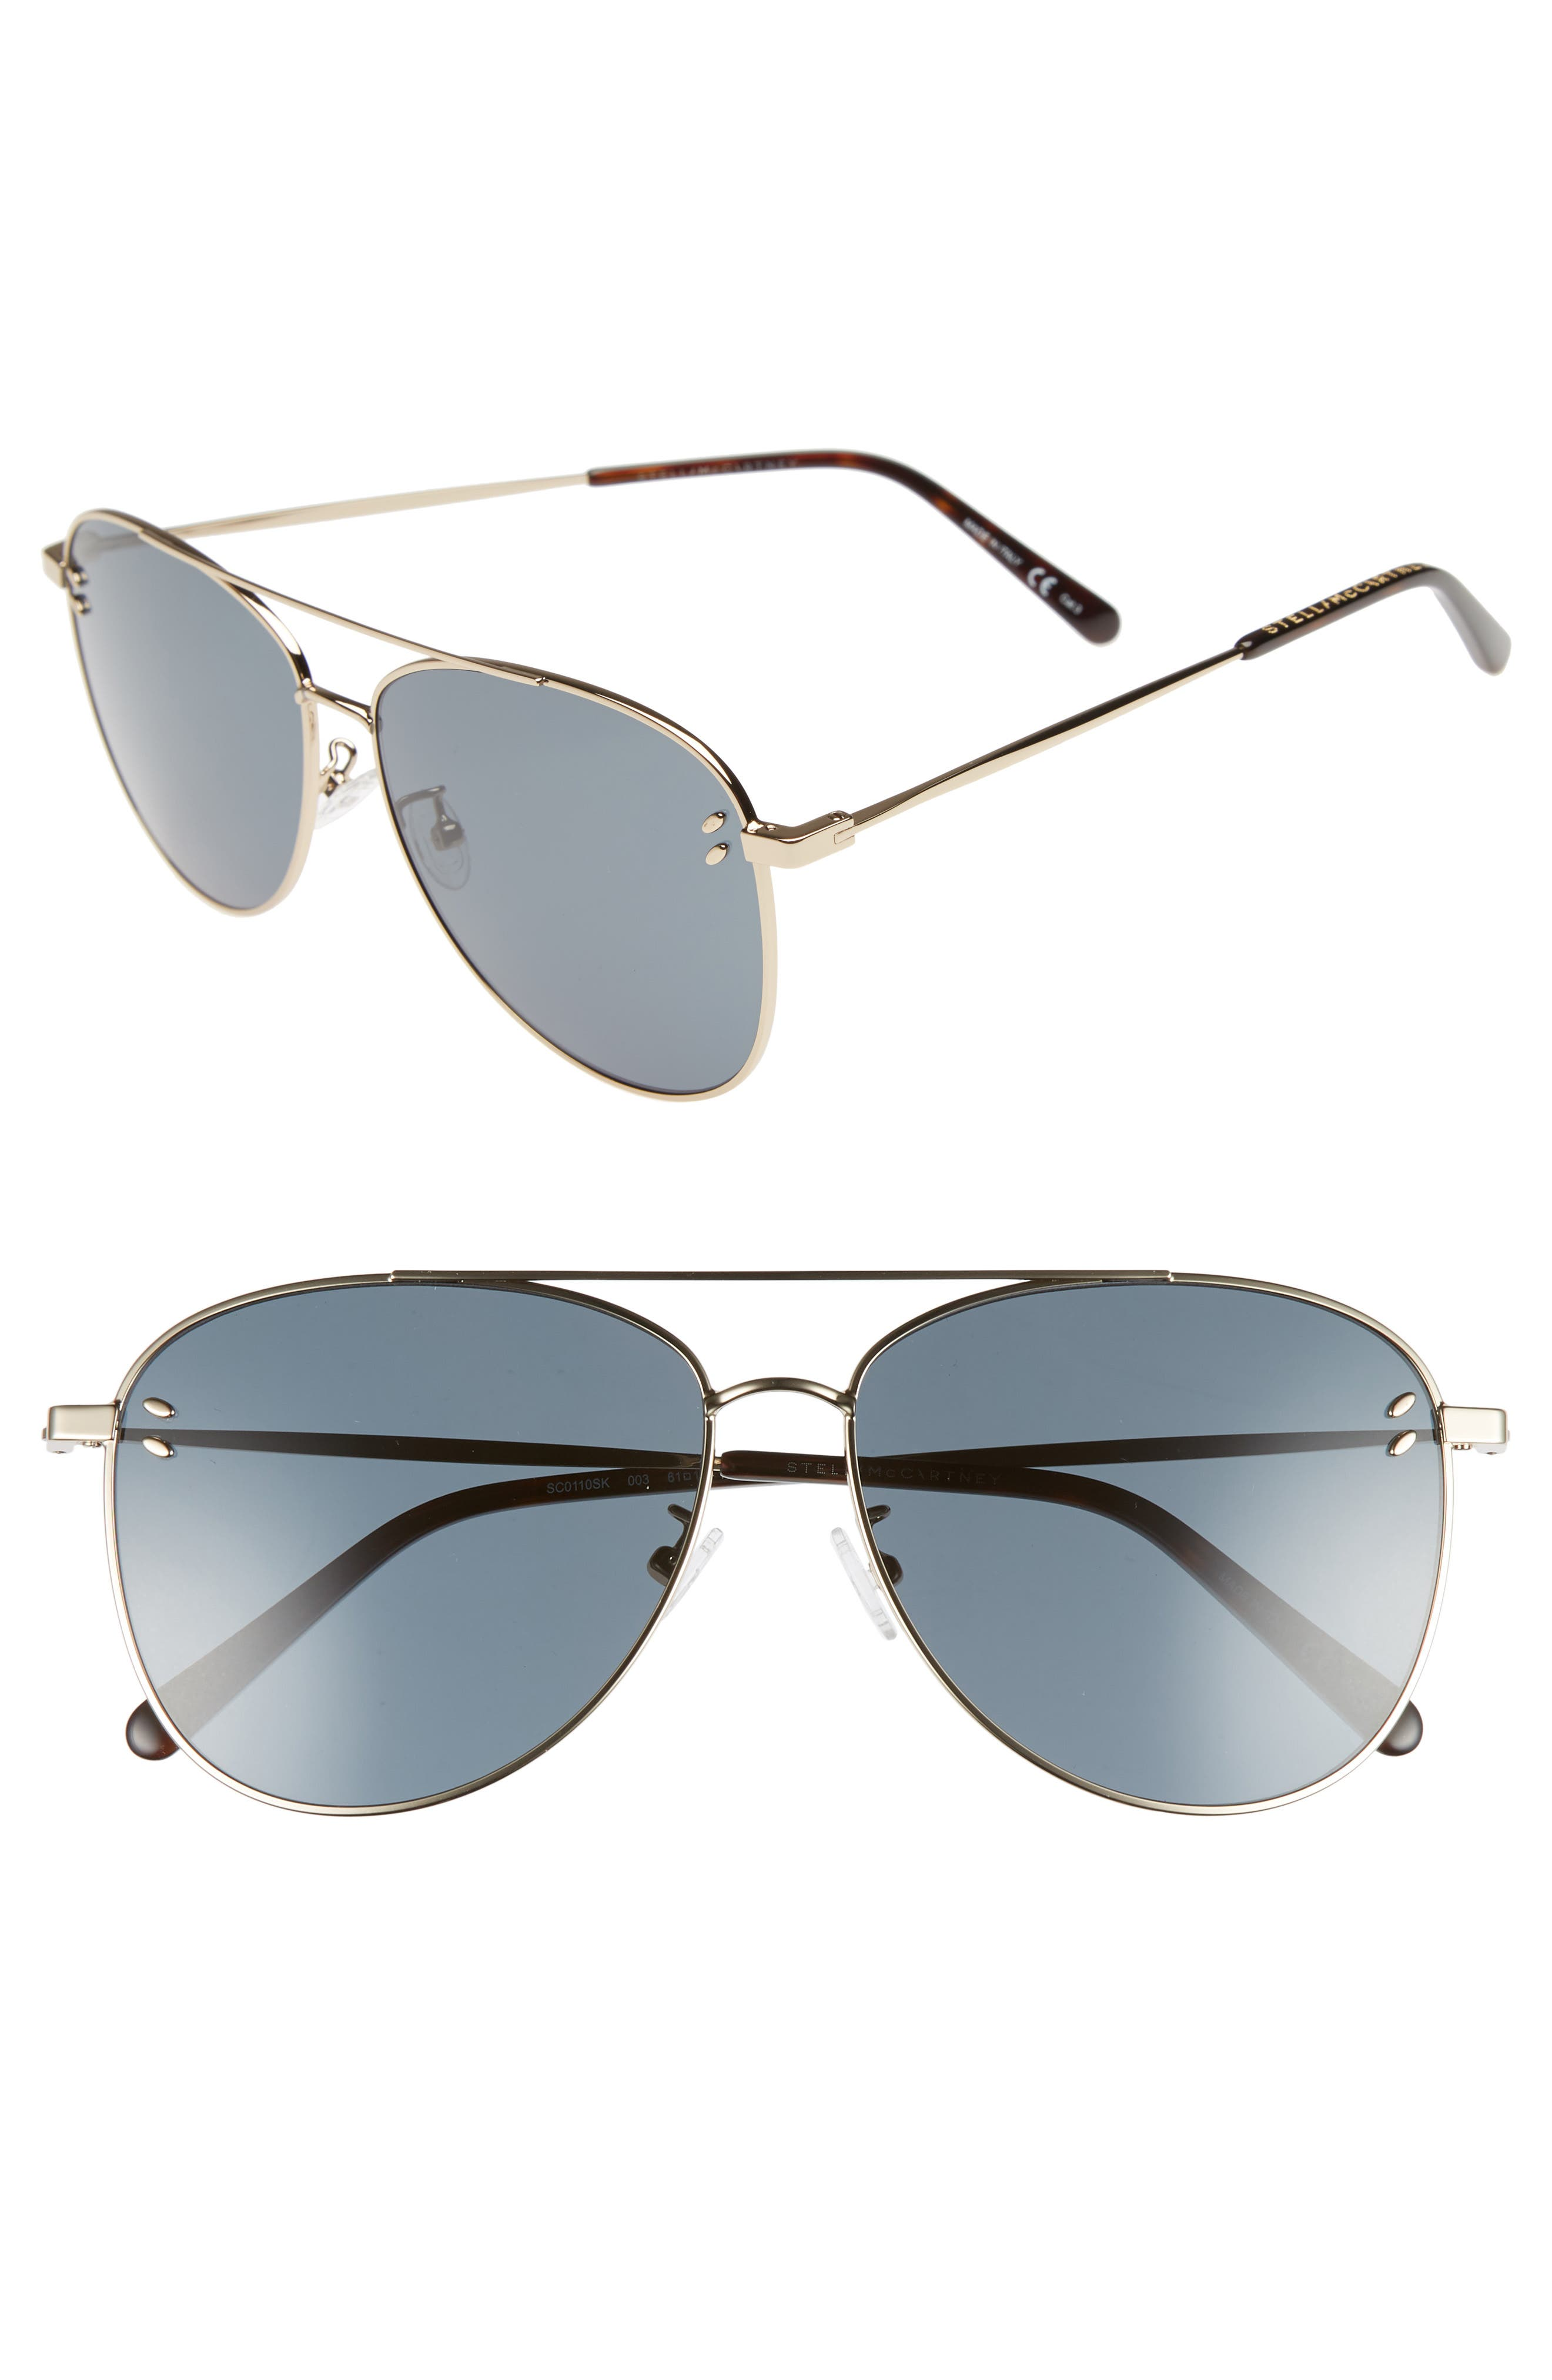 61mm Aviator Sunglasses,                         Main,                         color, Gold